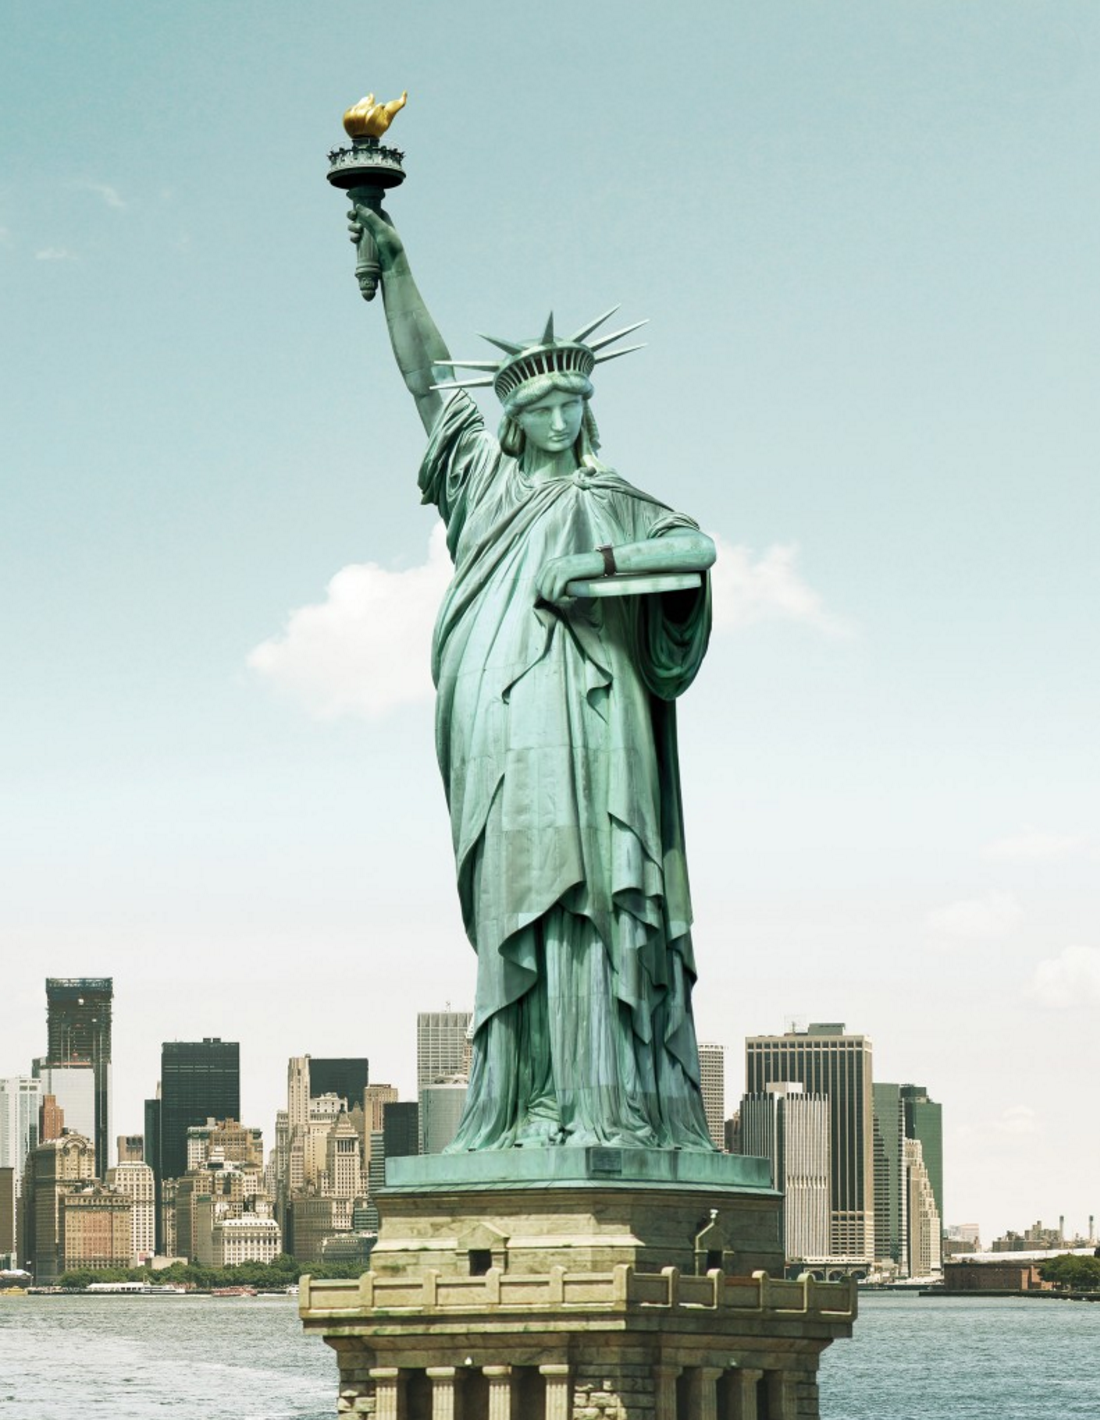 Emirates – Statue of Liberty